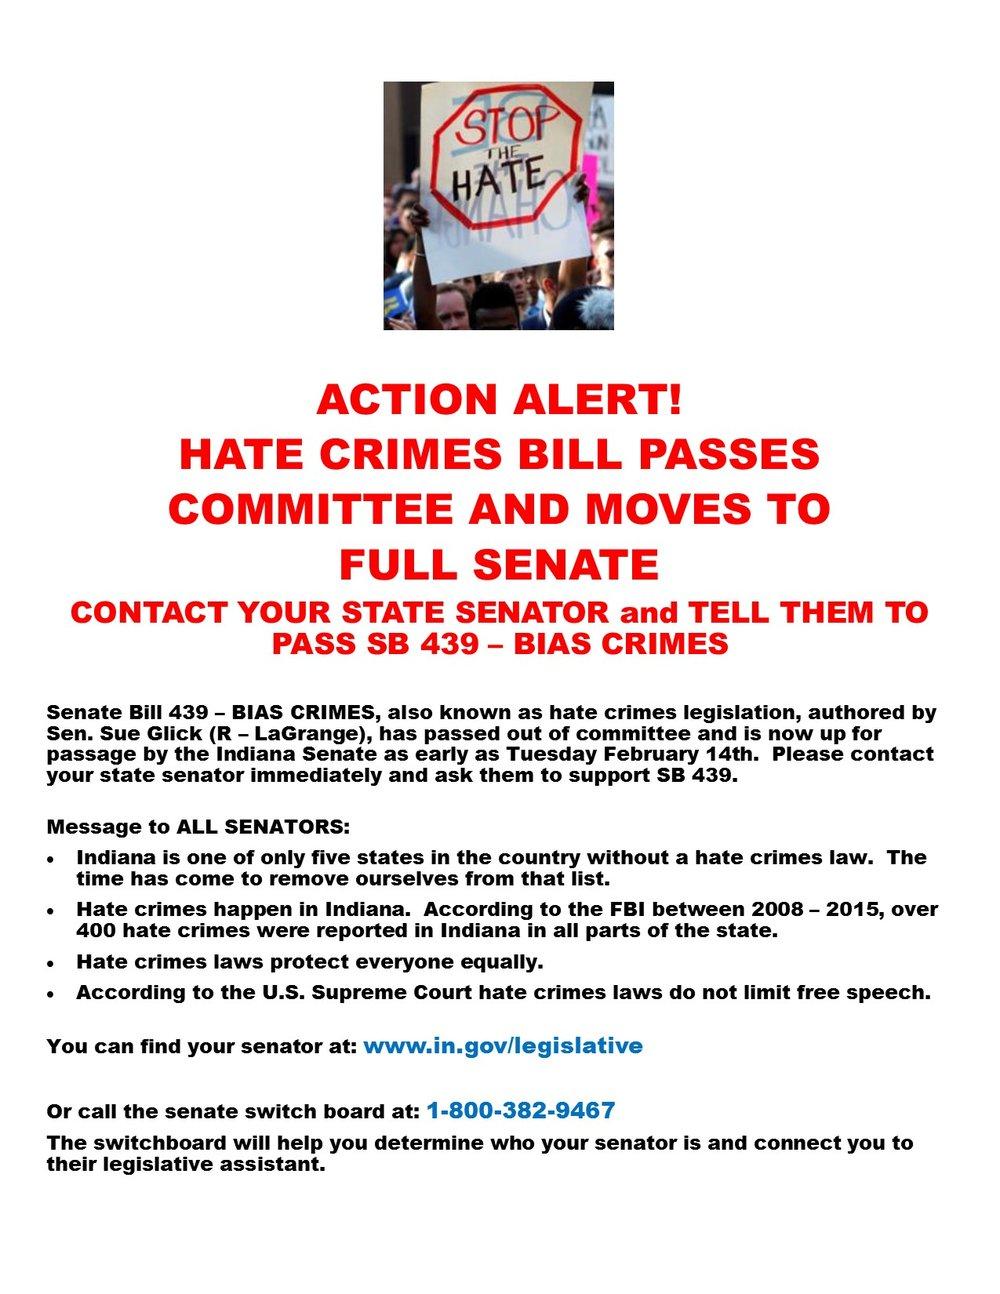 Legislative Action Alert Bill To >> Women4change Indiana Immediate Action Alert Pass Sb439